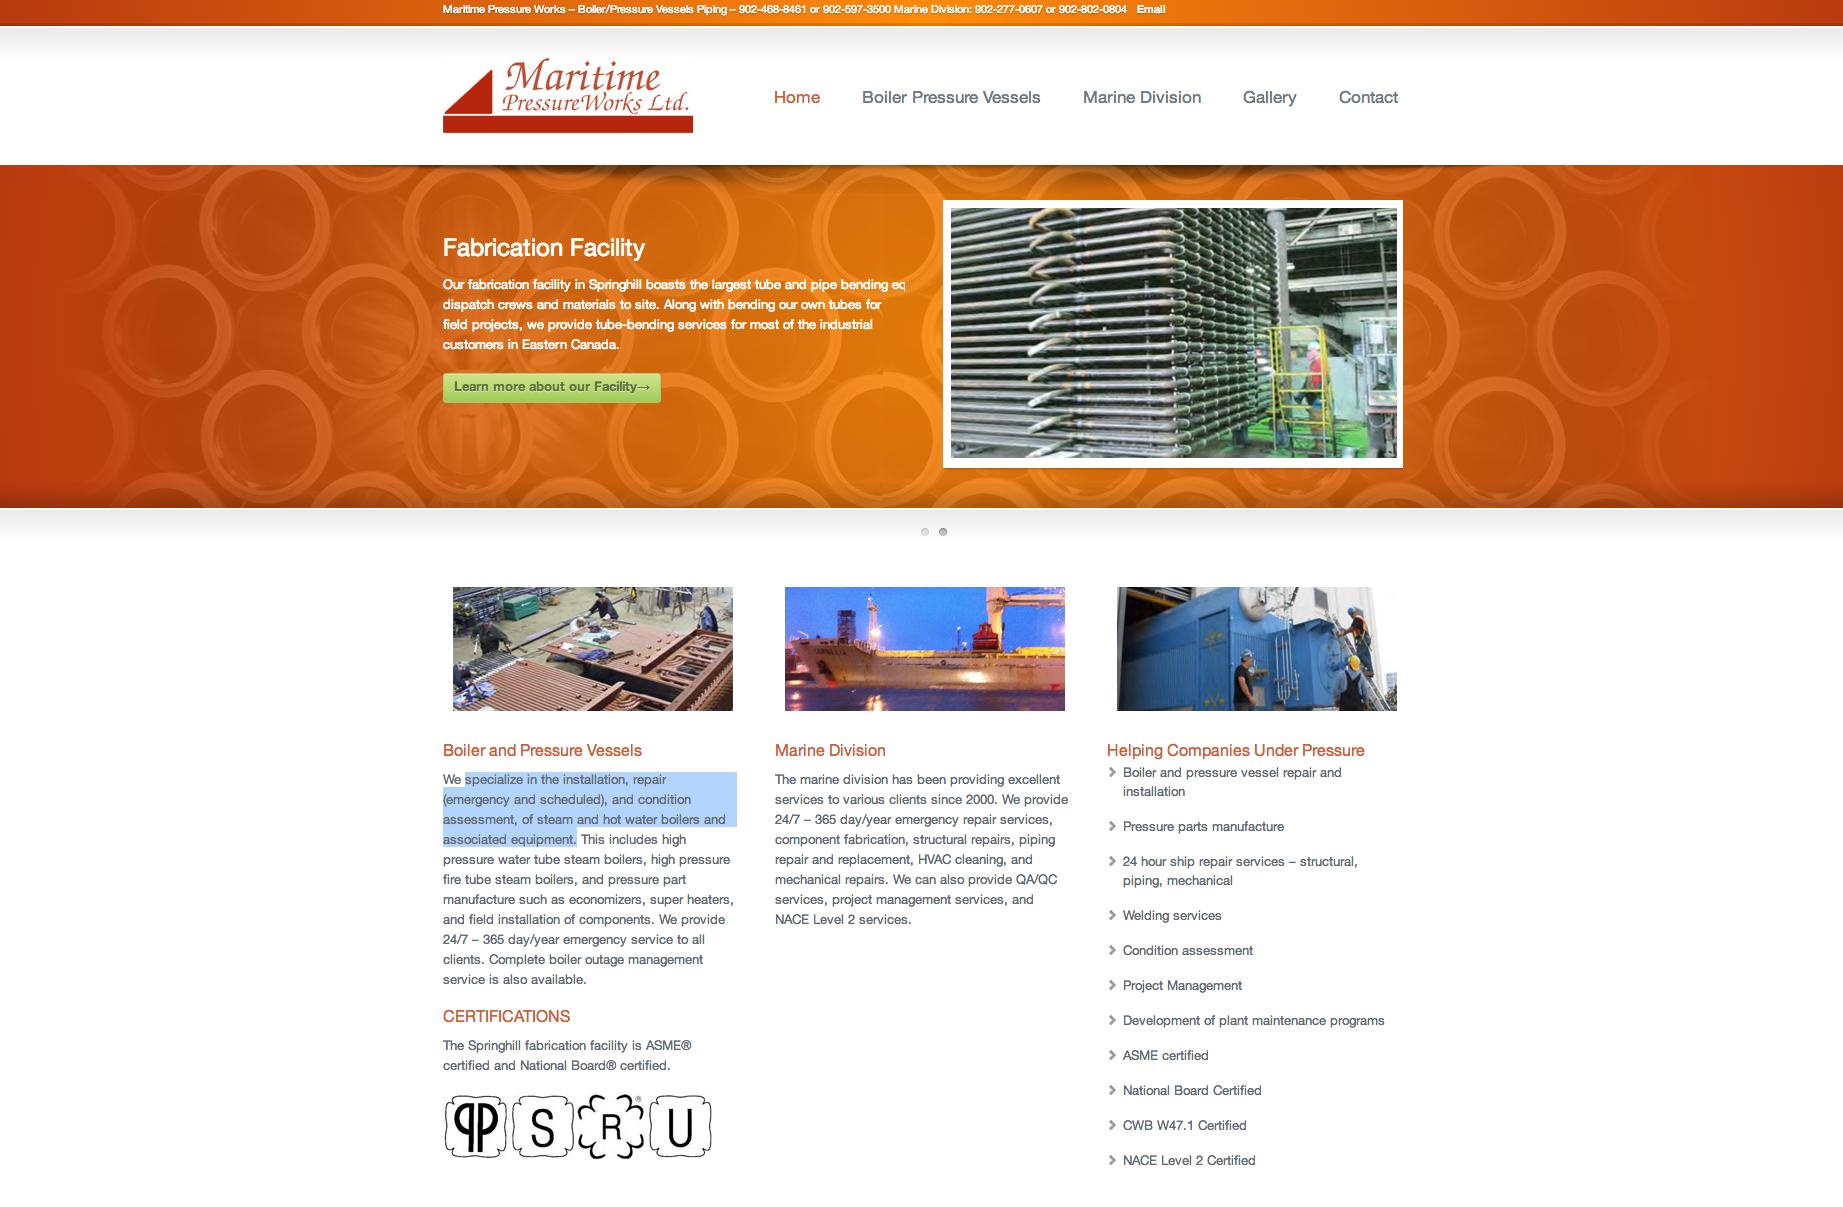 Maritime Pressure Works Ltd